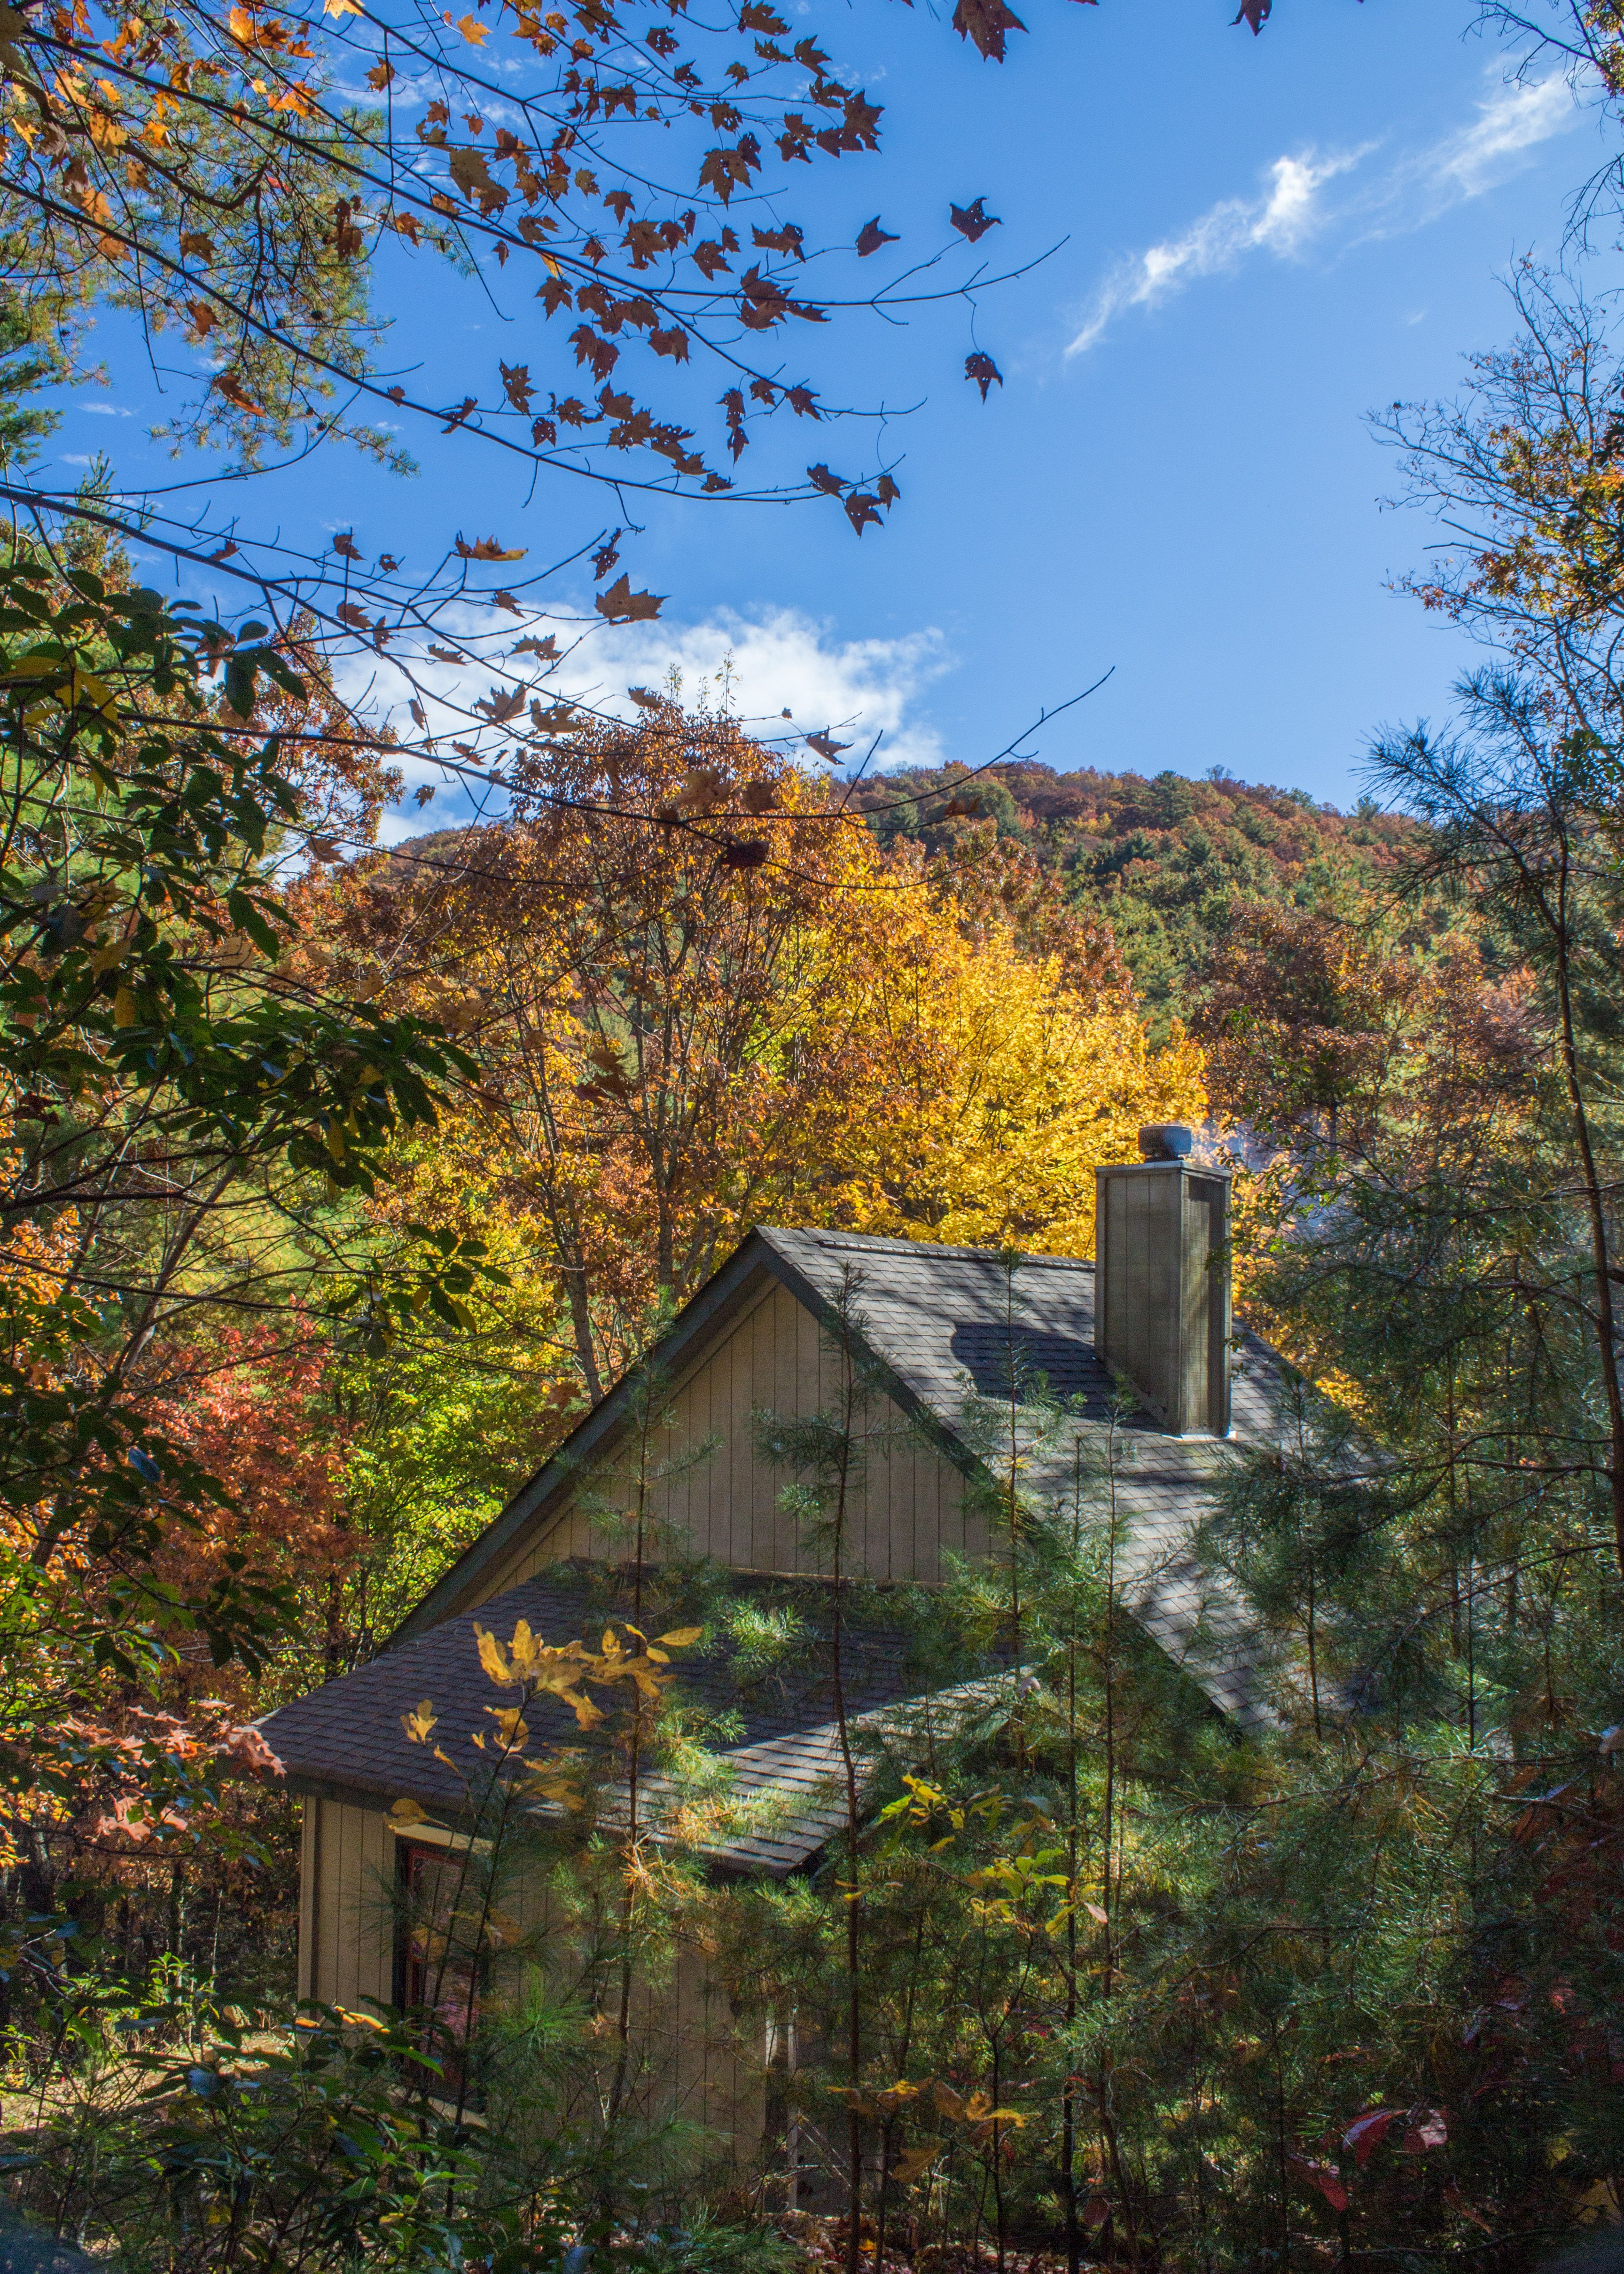 Bon Ananda Spa Cabin   Wilderness View Cabins   Chatsworth, Georgia   Ellijay,  Georgia